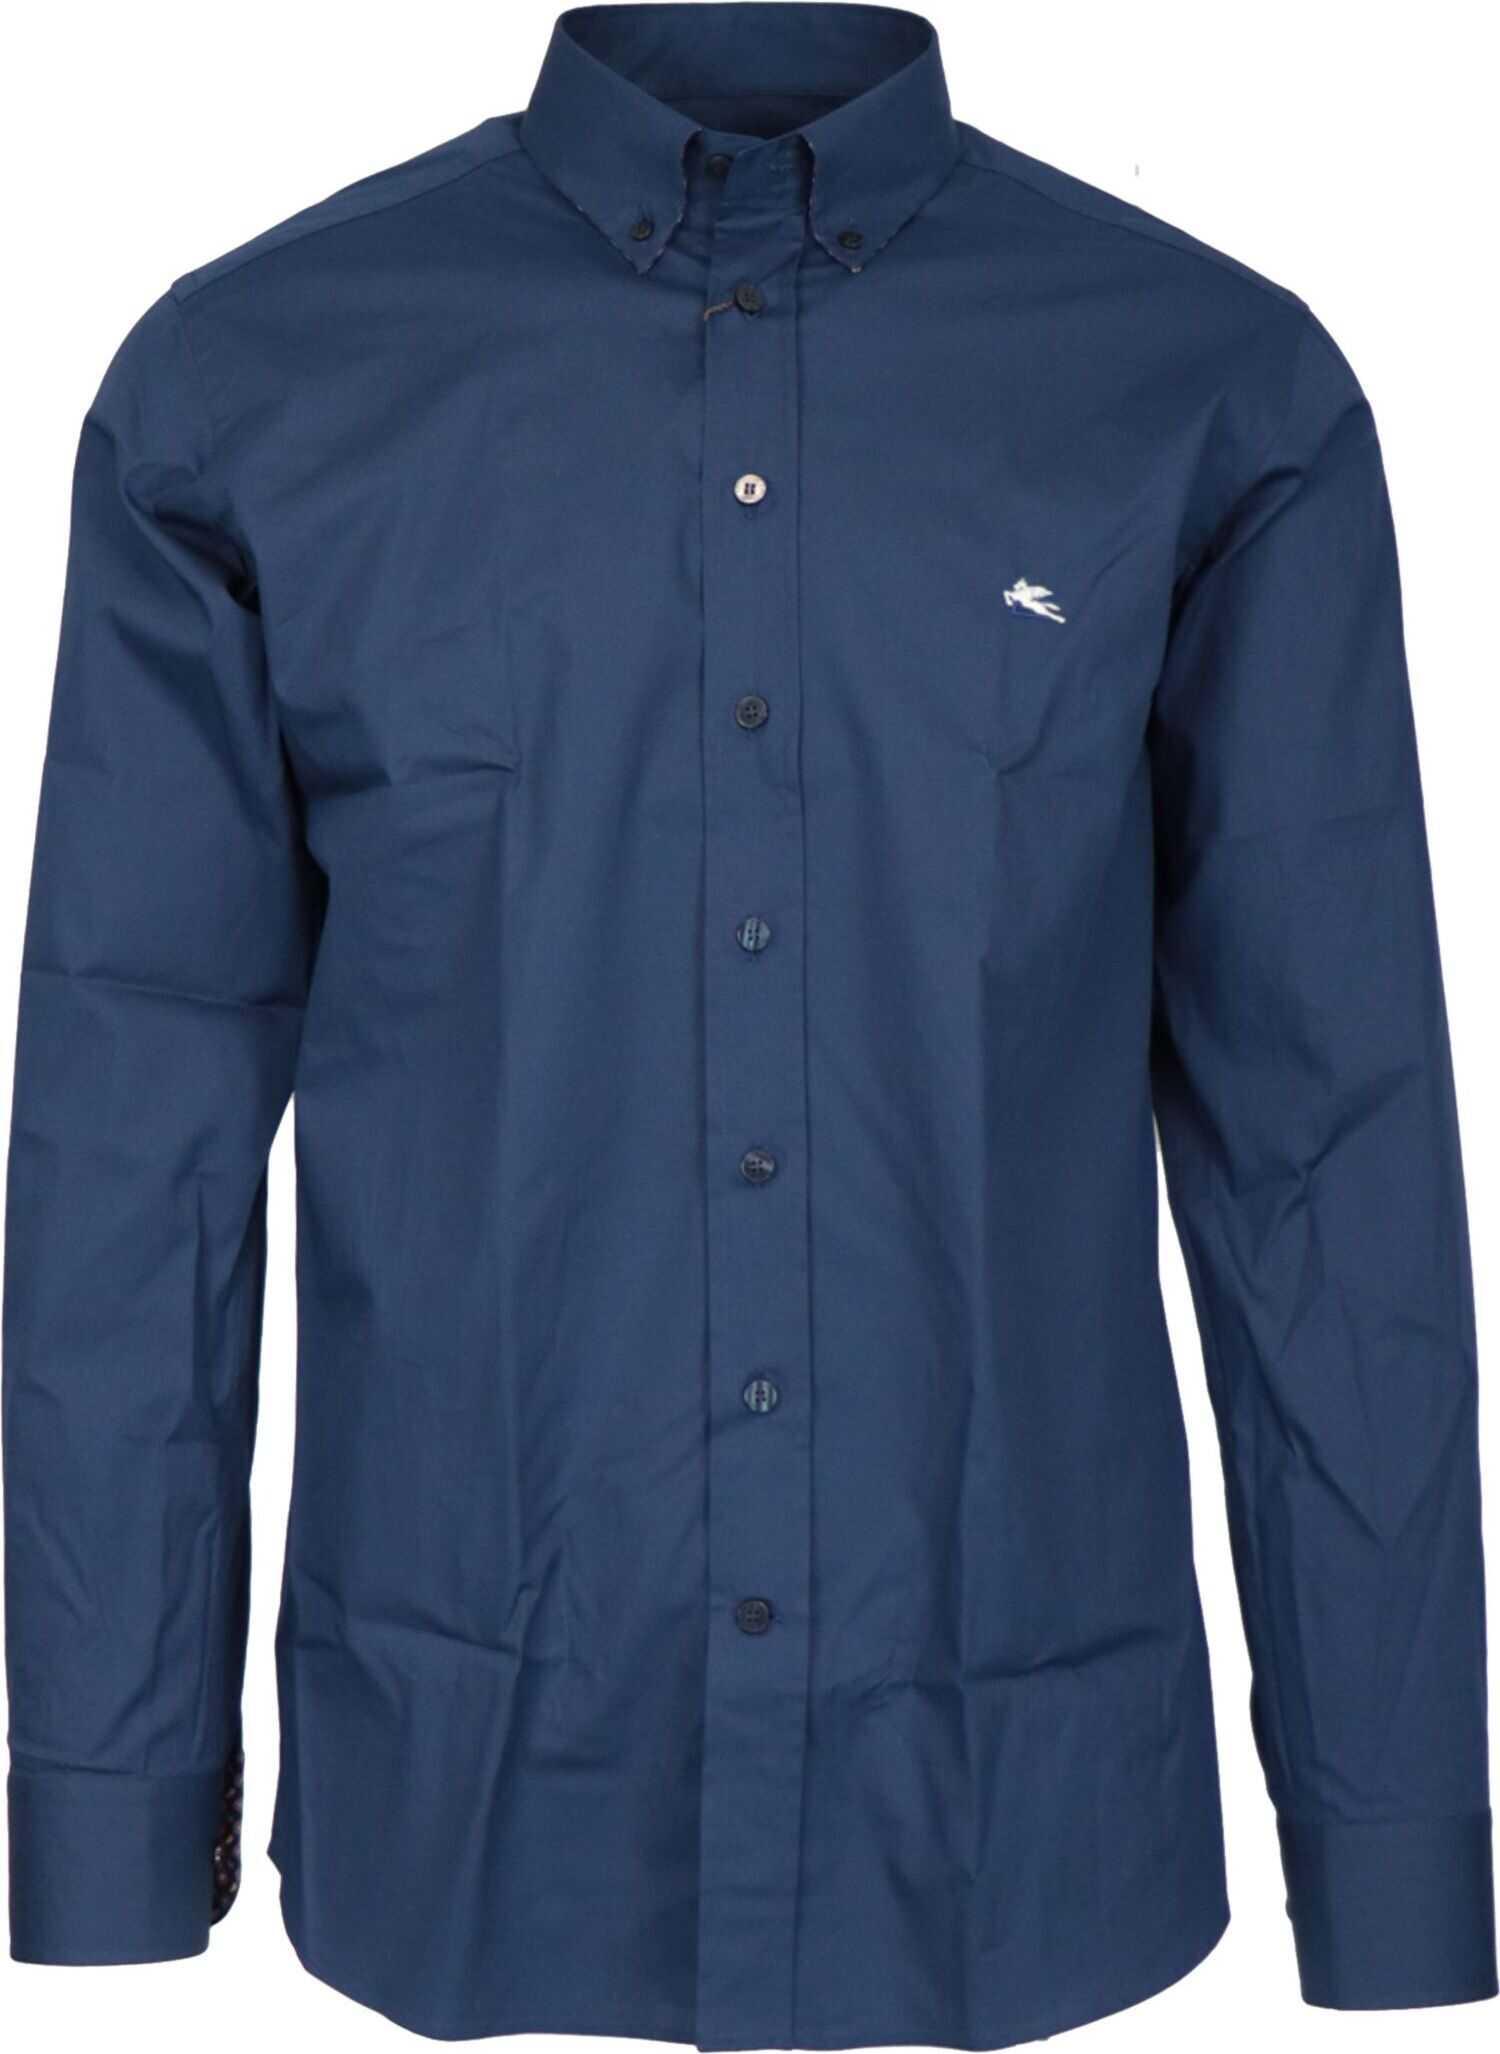 ETRO Cotton Shirt BLUE